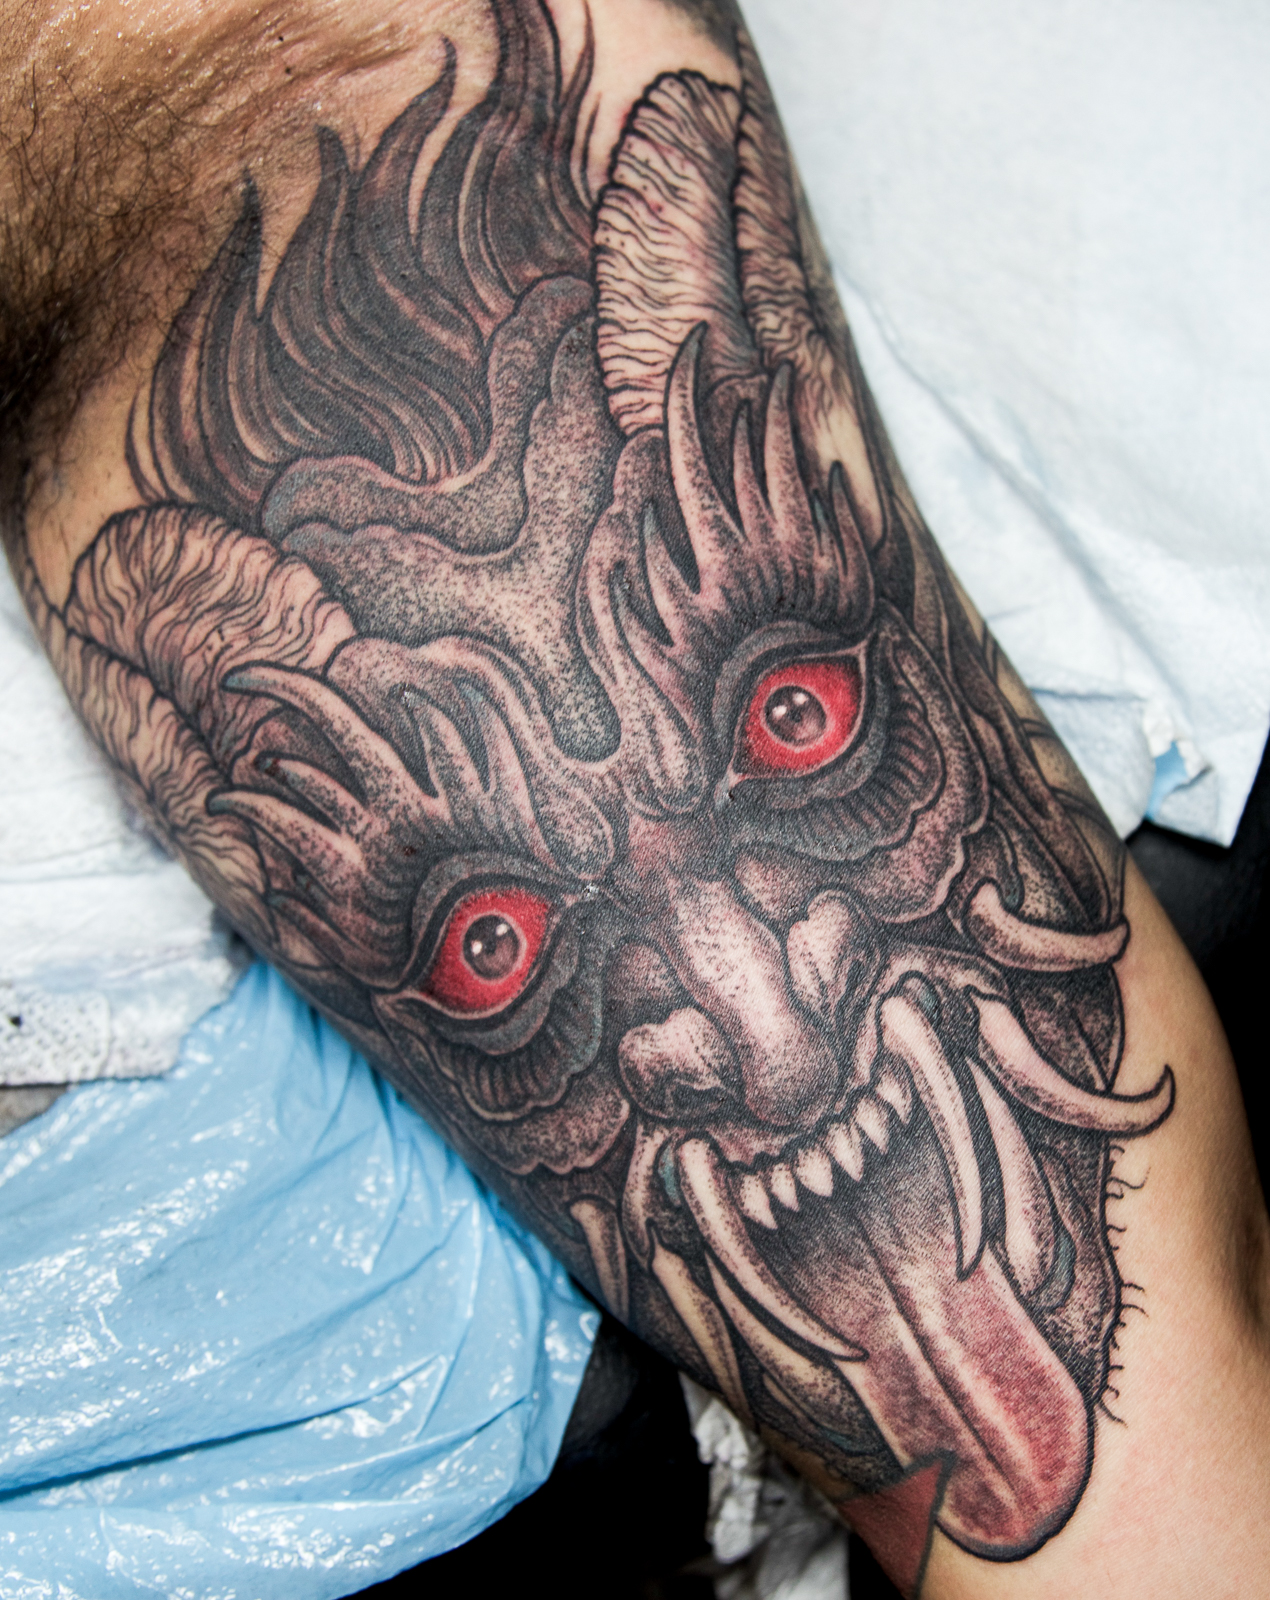 Stipple Devil enrique bernal ejay tattoo.jpg